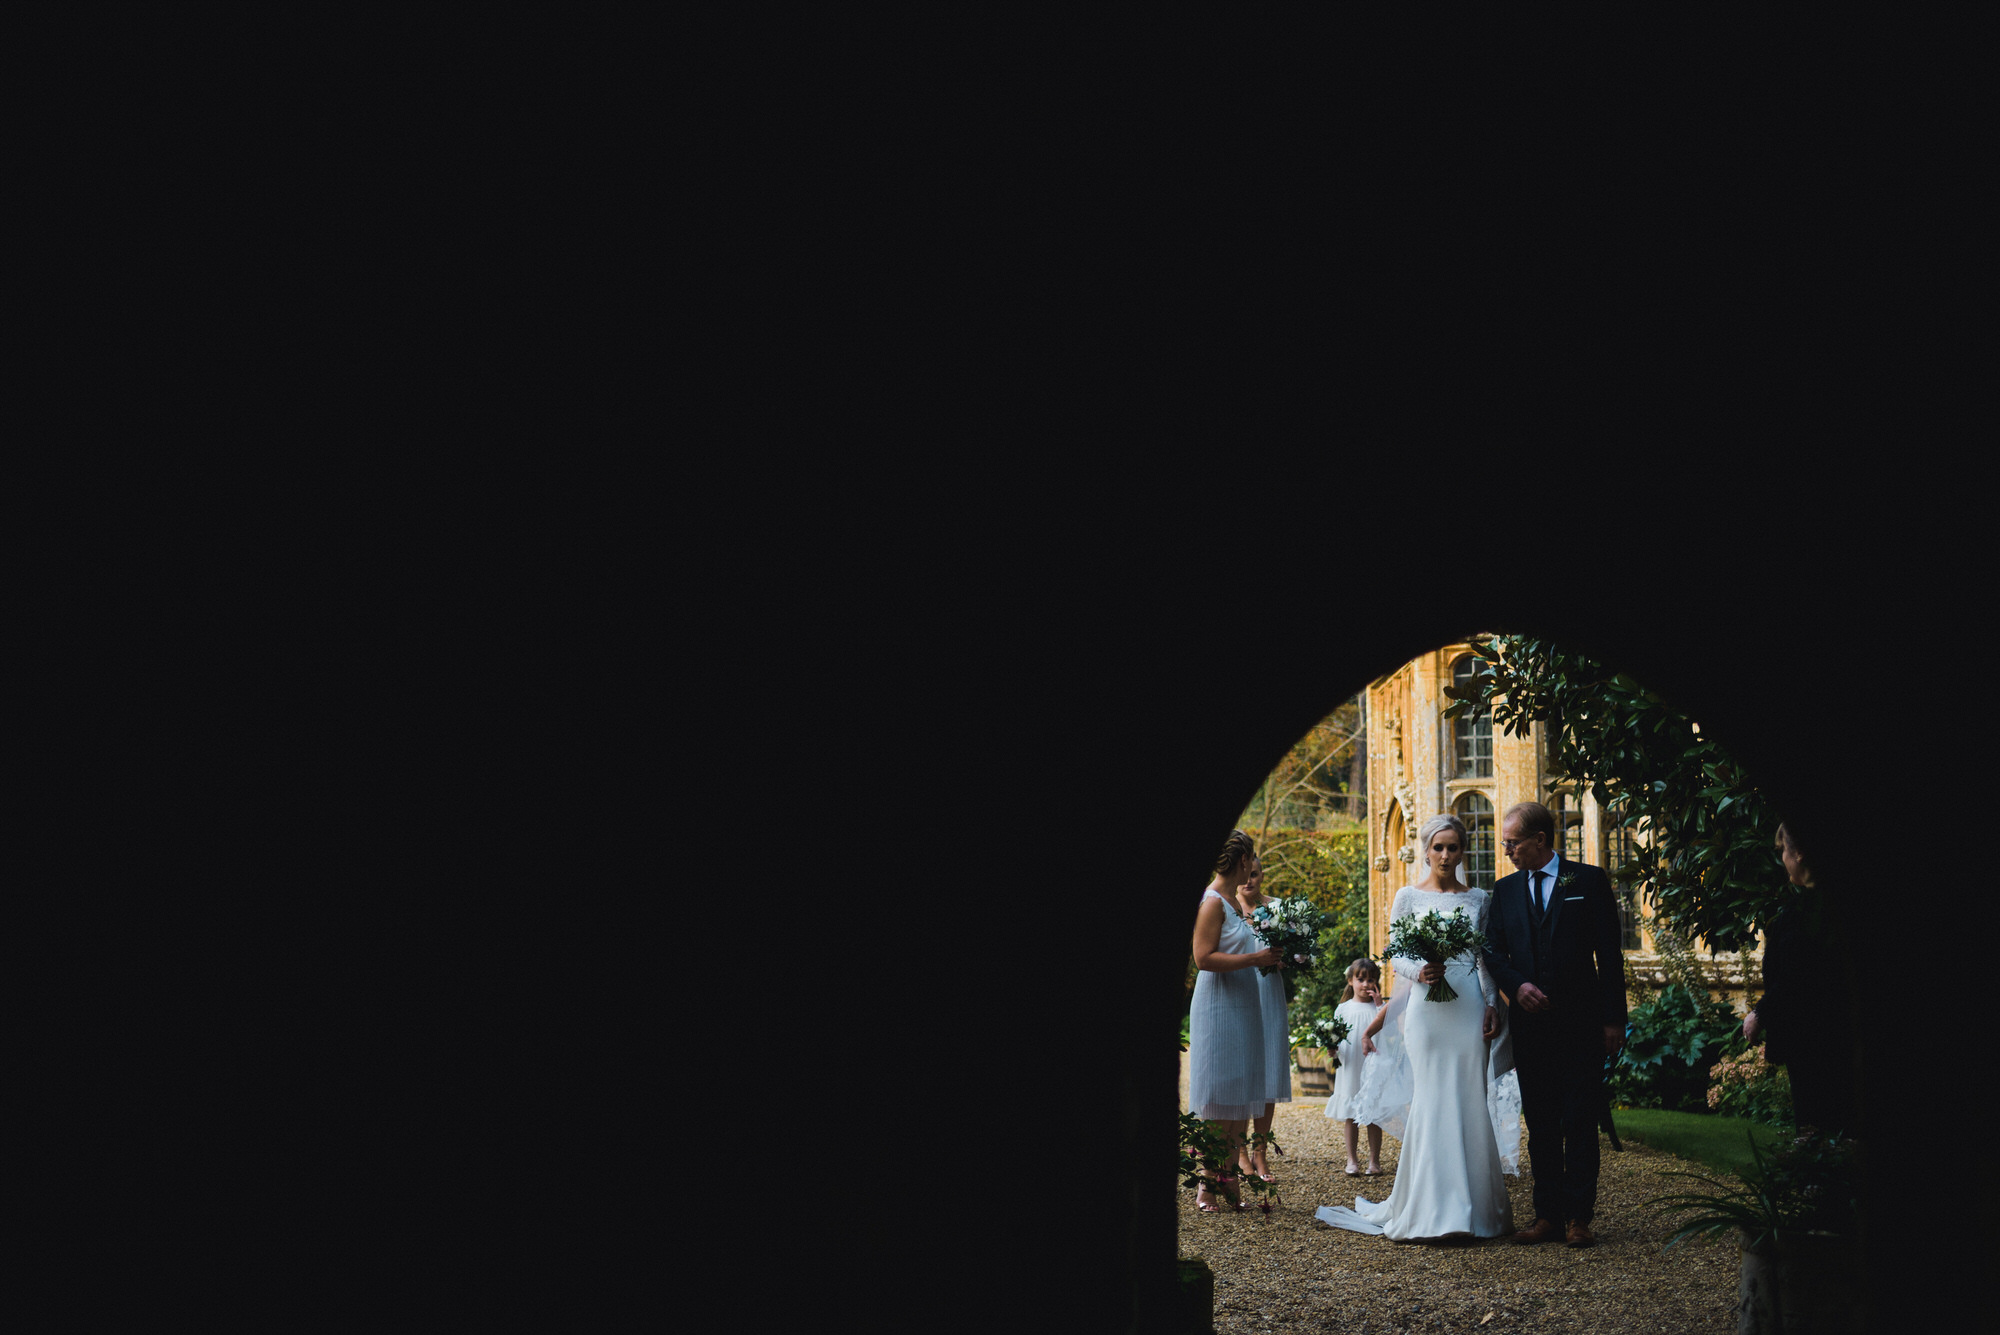 Brympton House wedding ceremony by simon biffen photography 17